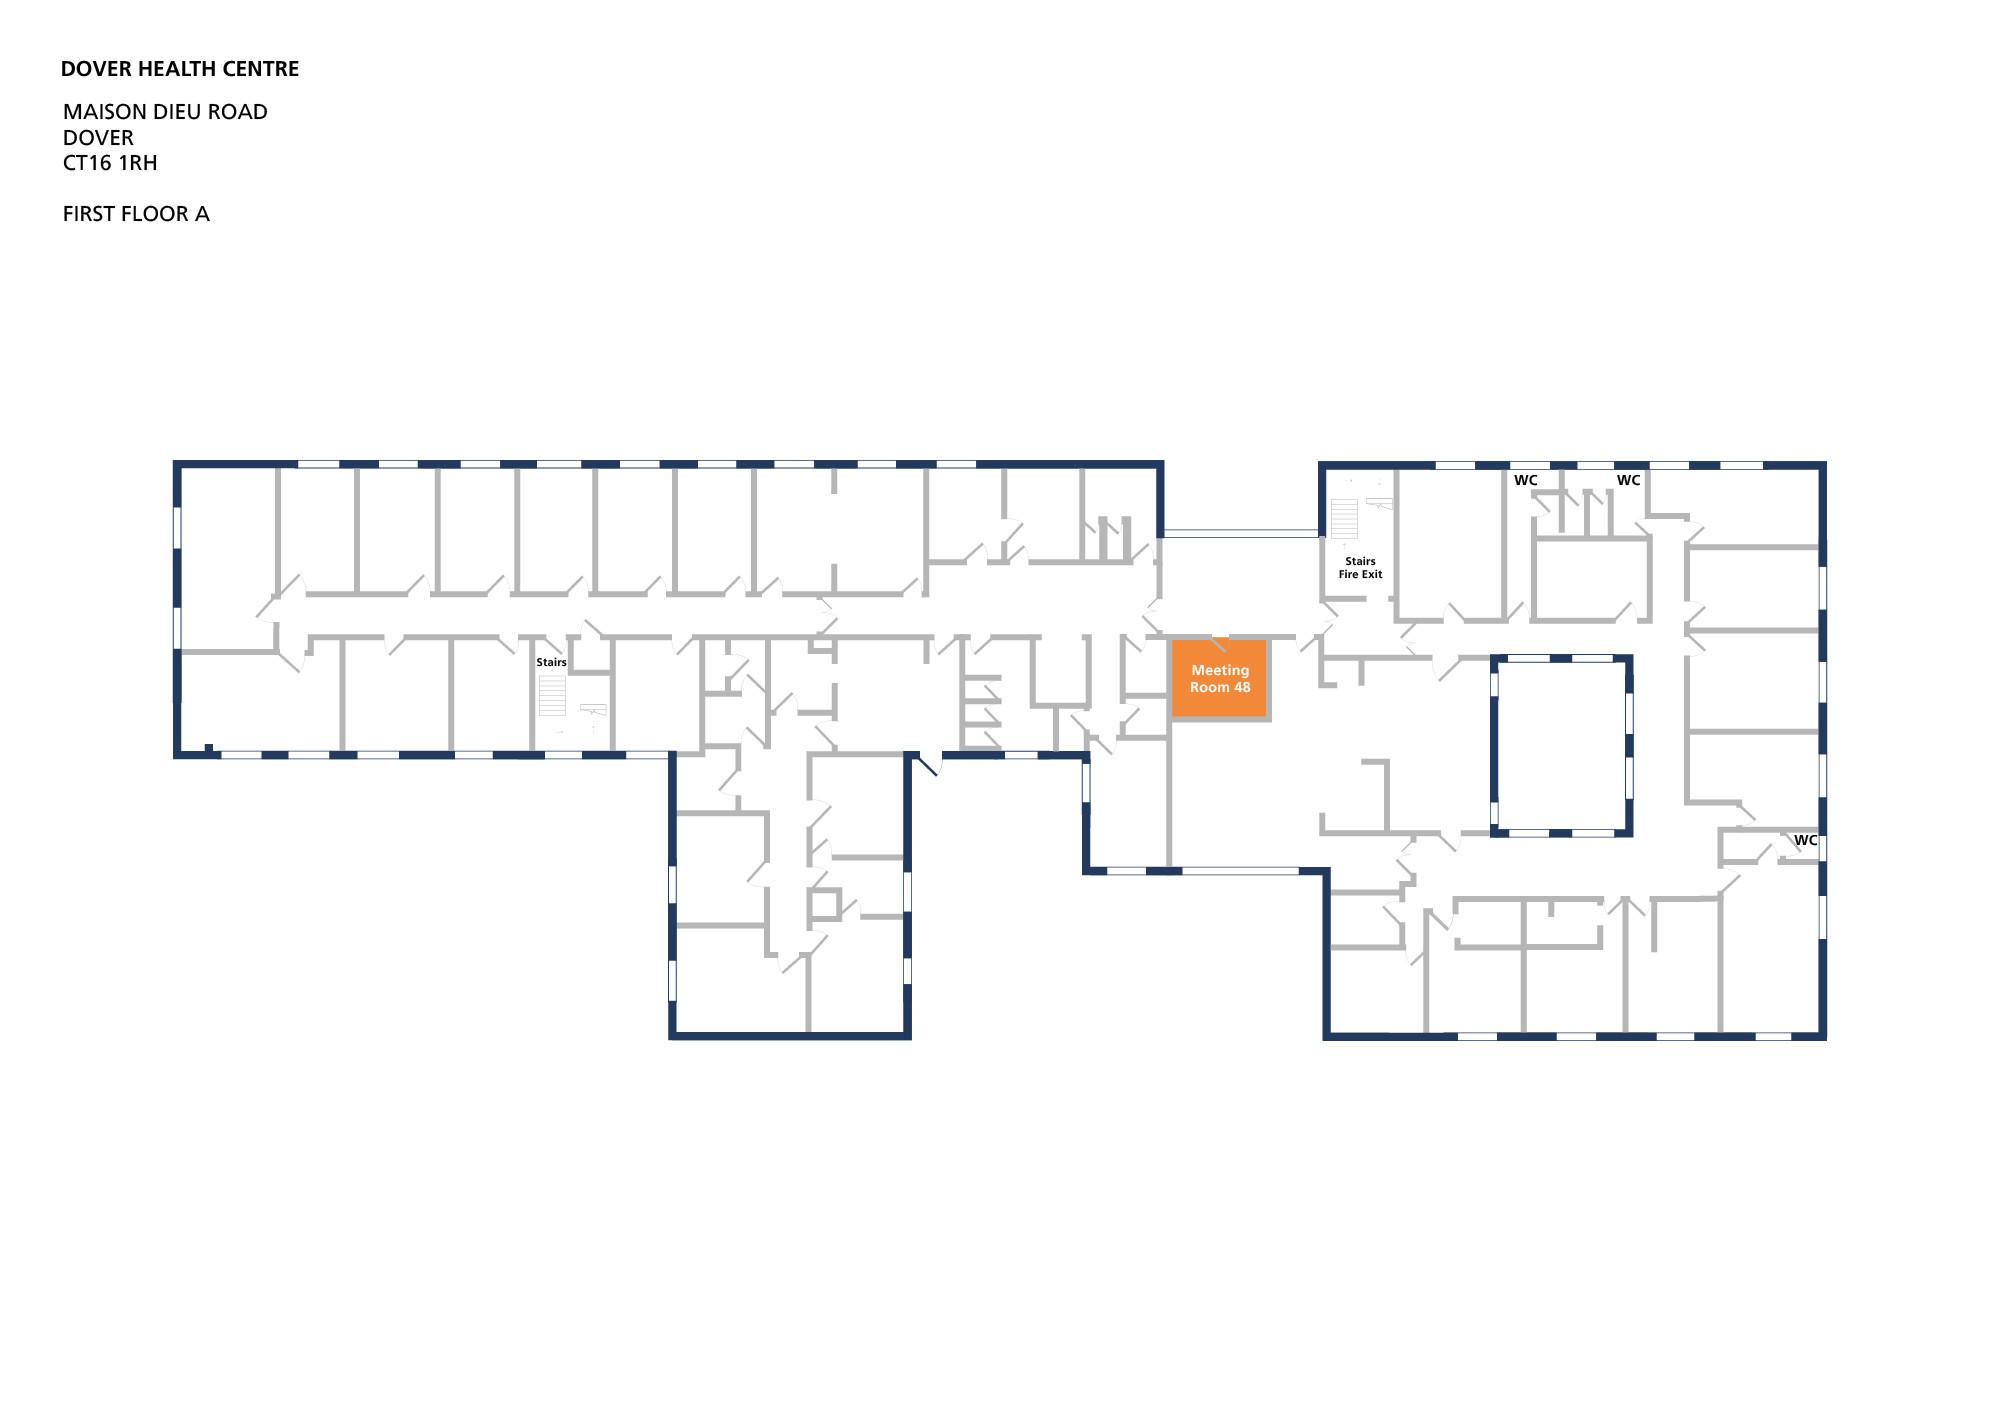 Dover health centre room meeting room 48 v1